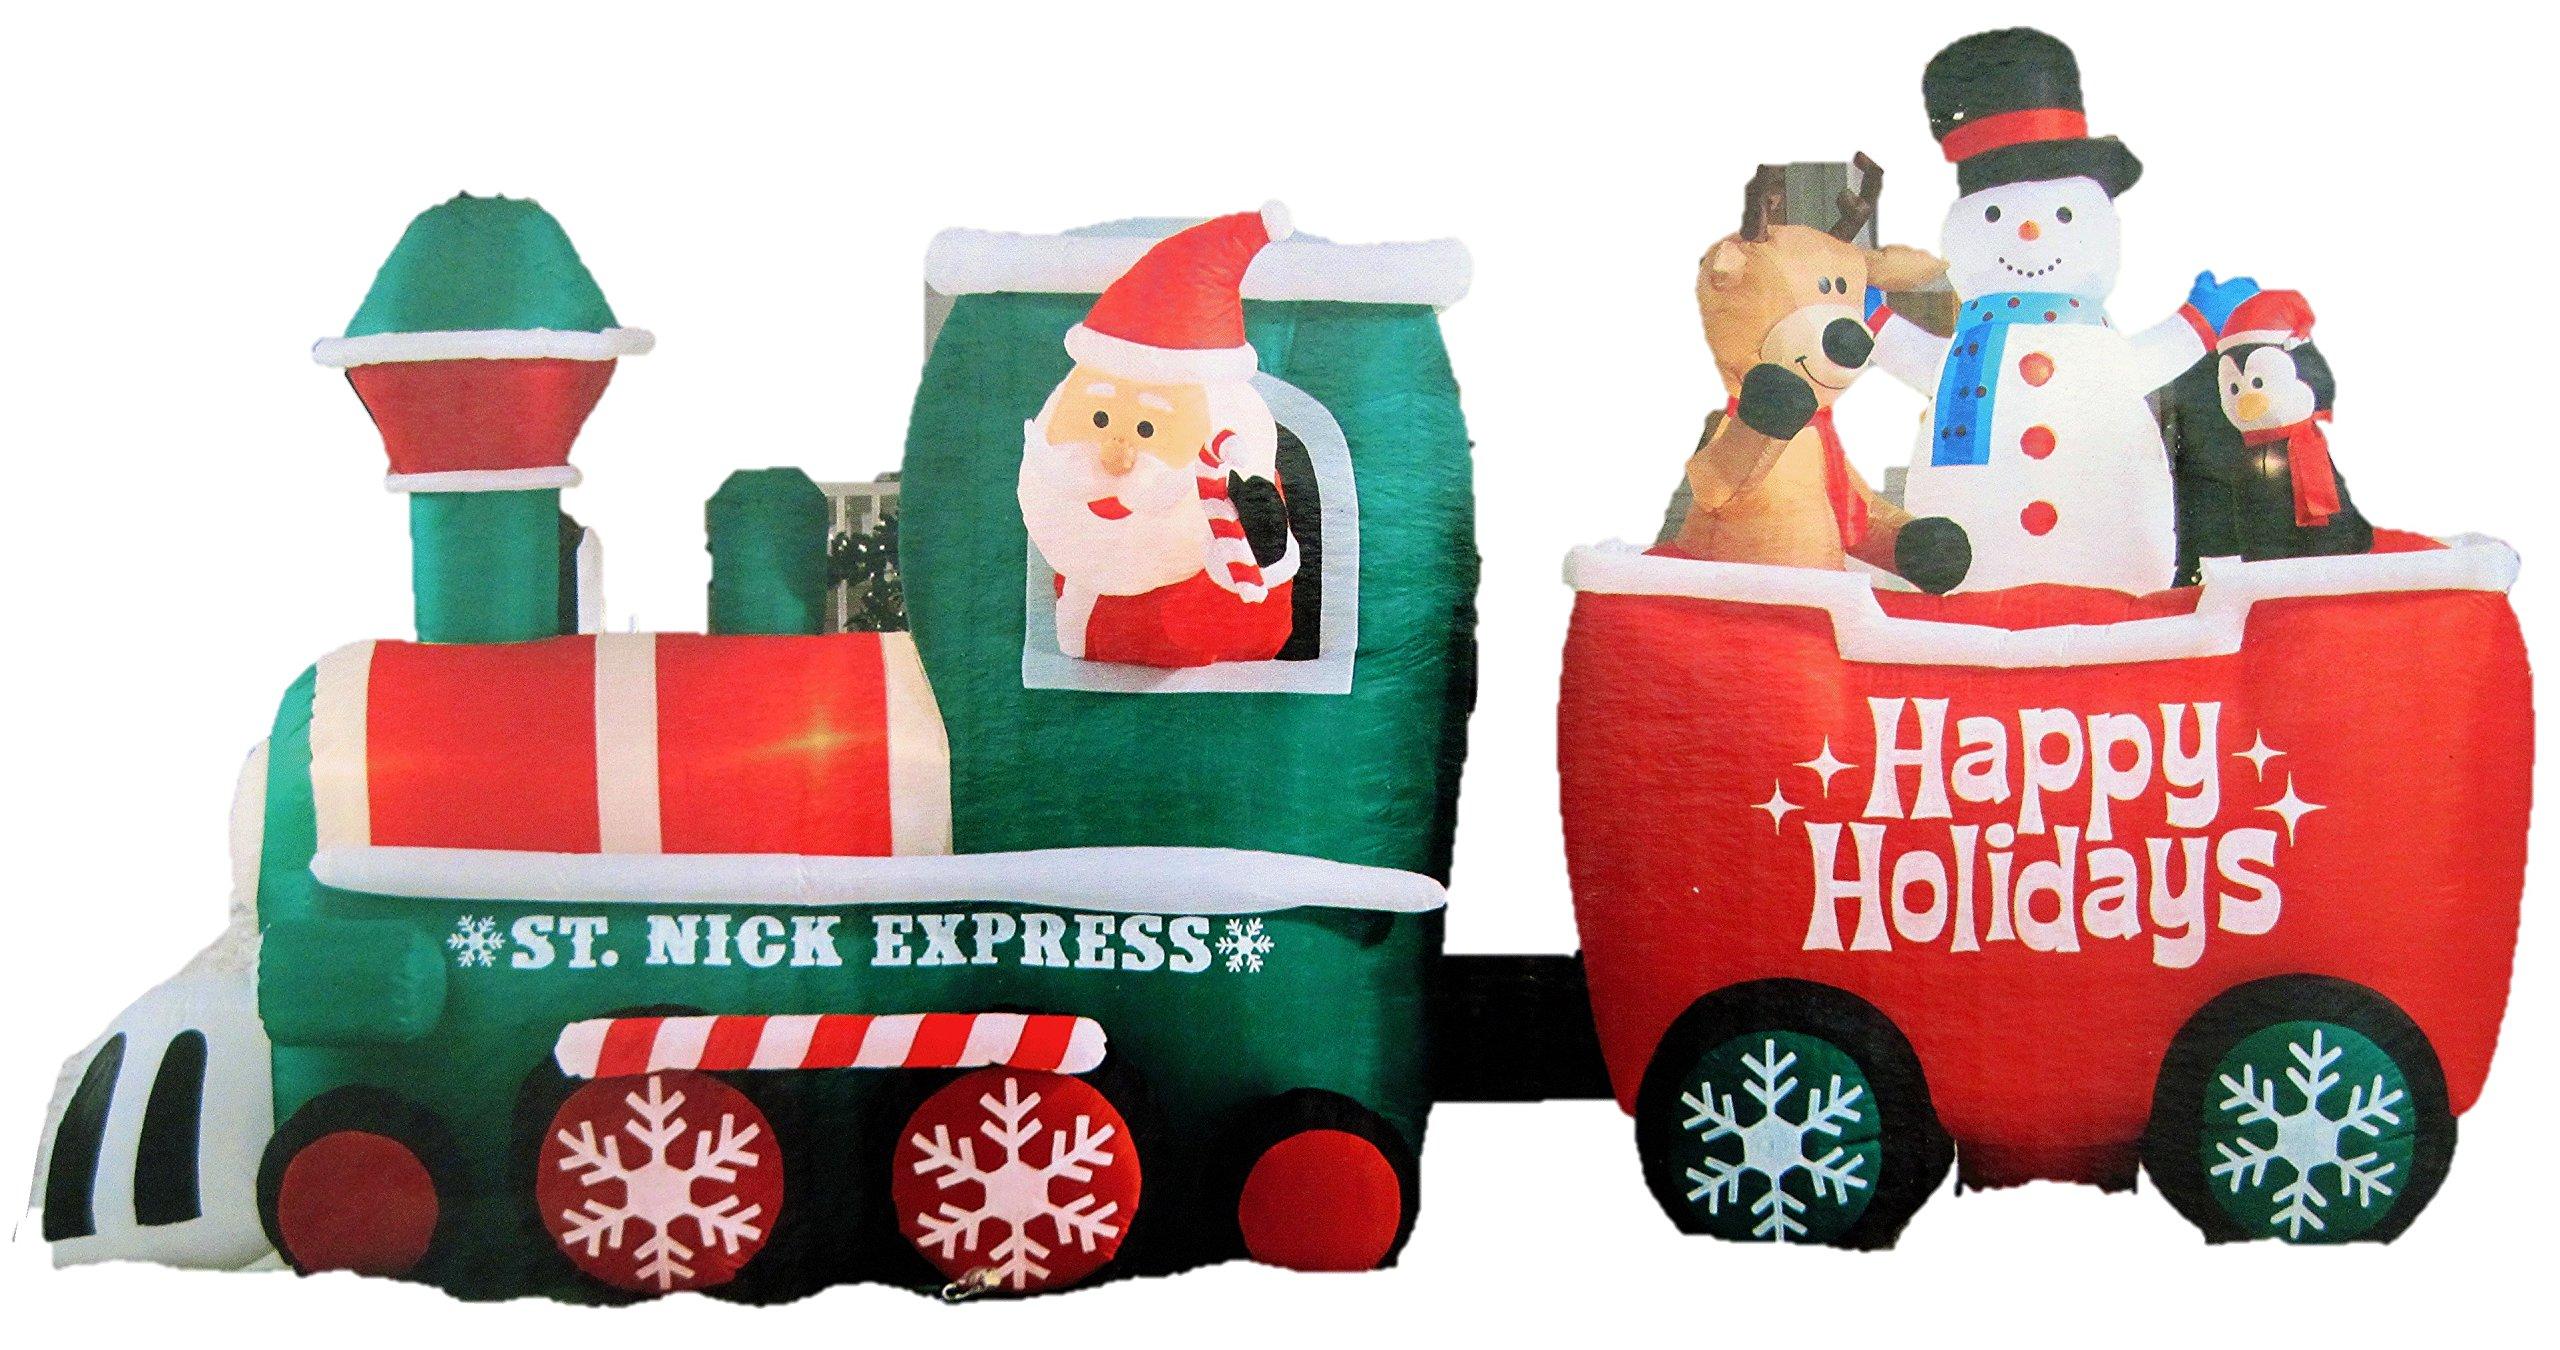 saint nick express christmas inflatable train measures 155 ft long